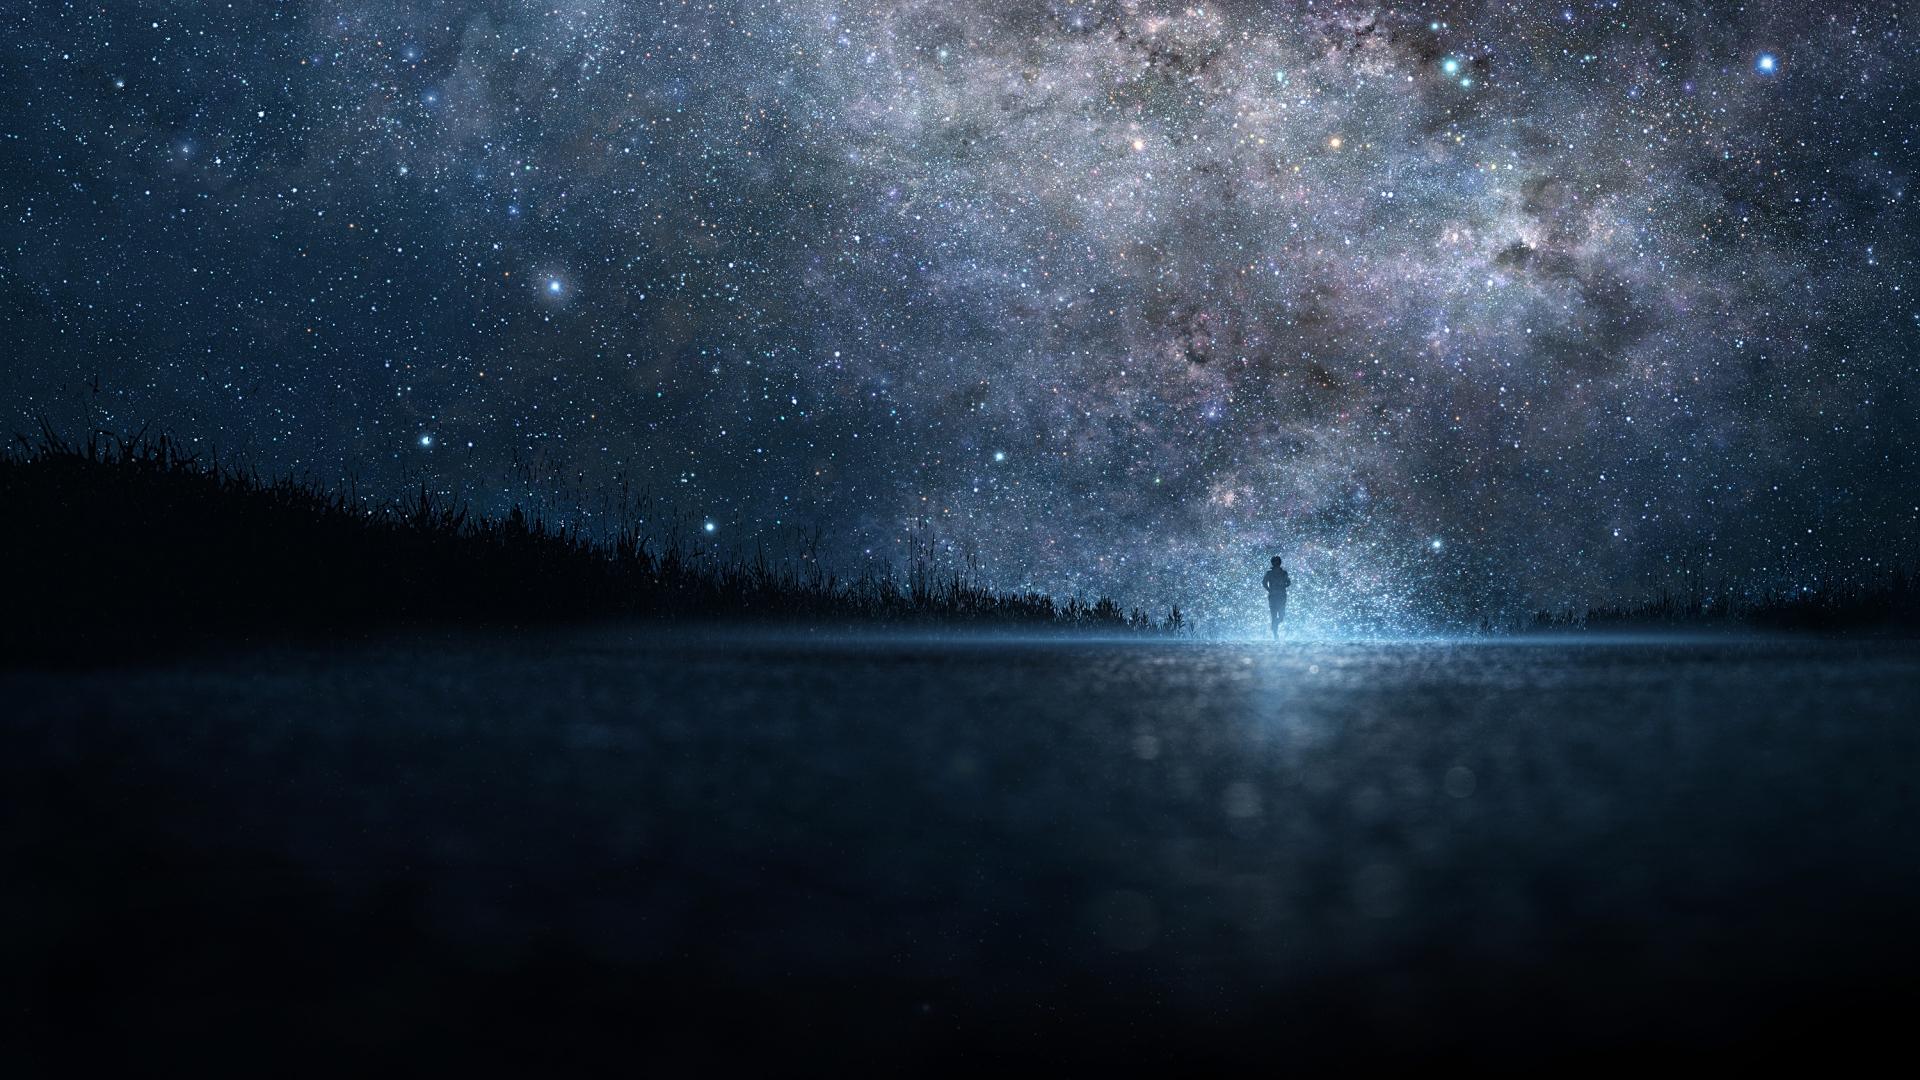 star_art_sky_night_people_silhouette_98142_1920x1080.jpg